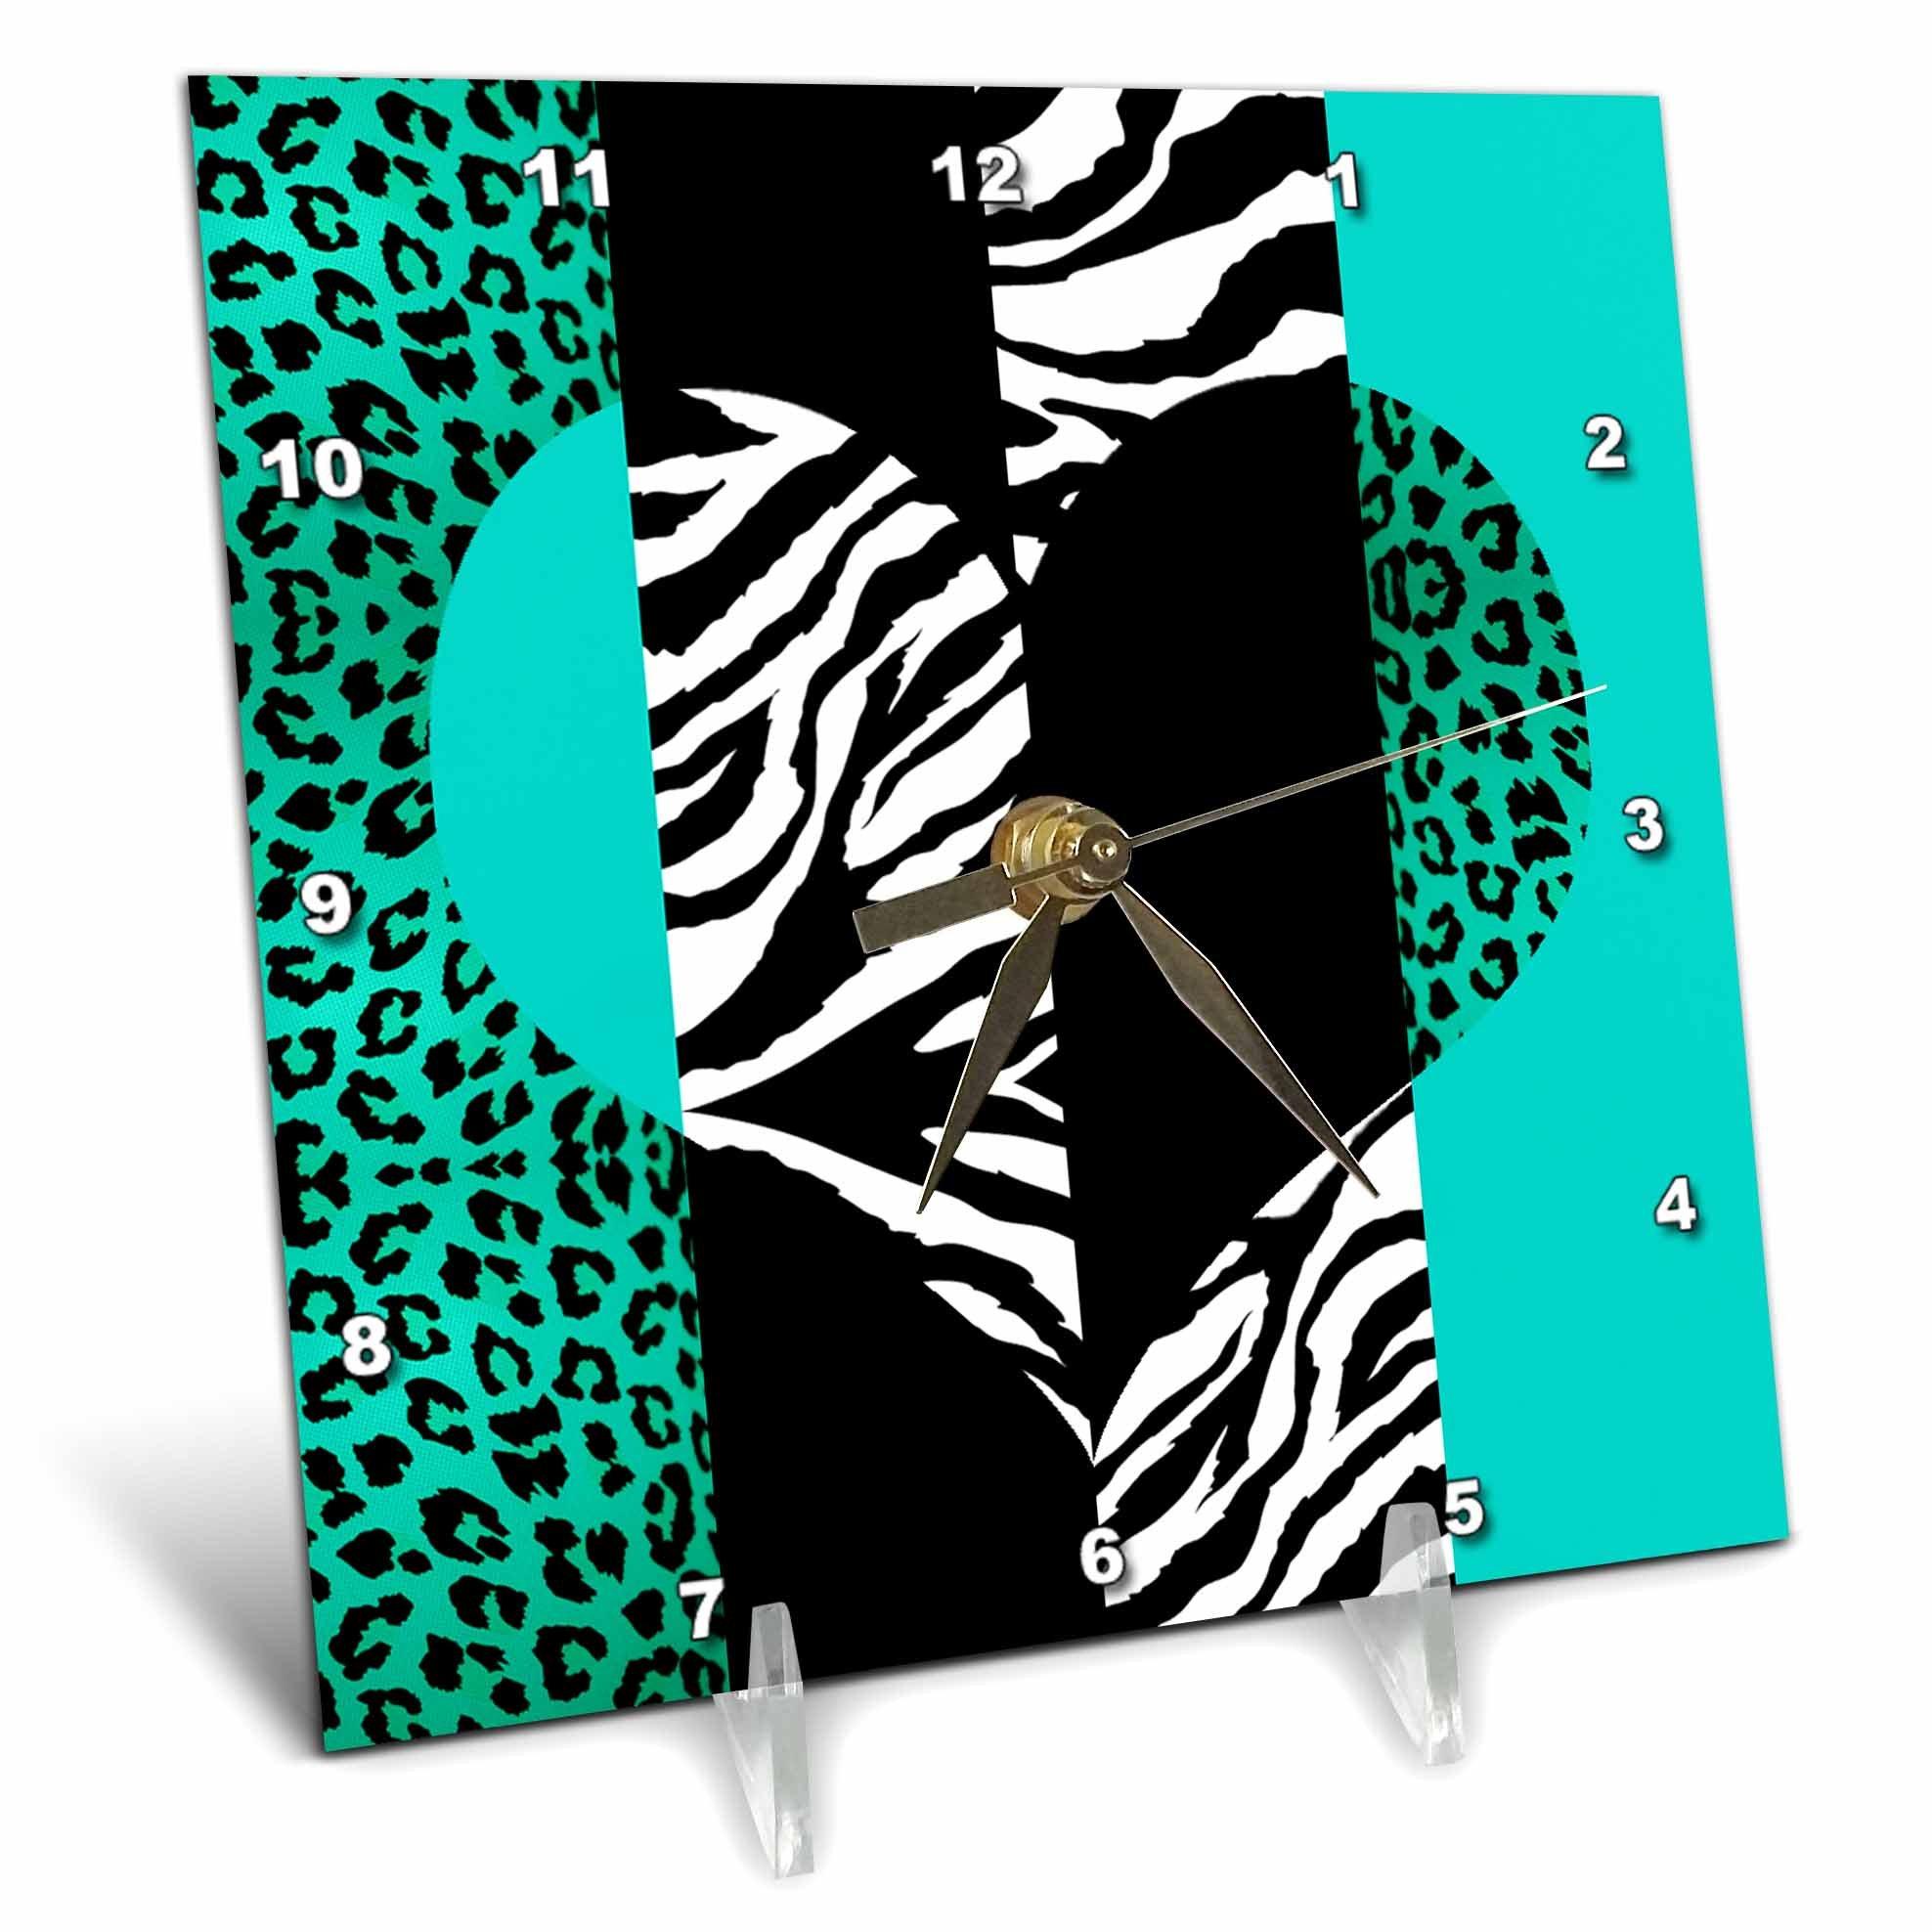 3dRose dc_35445_1 Aqua Blue Black and White Animal Print Leopard and Zebra Heart Desk Clock, 6 by 6-Inch